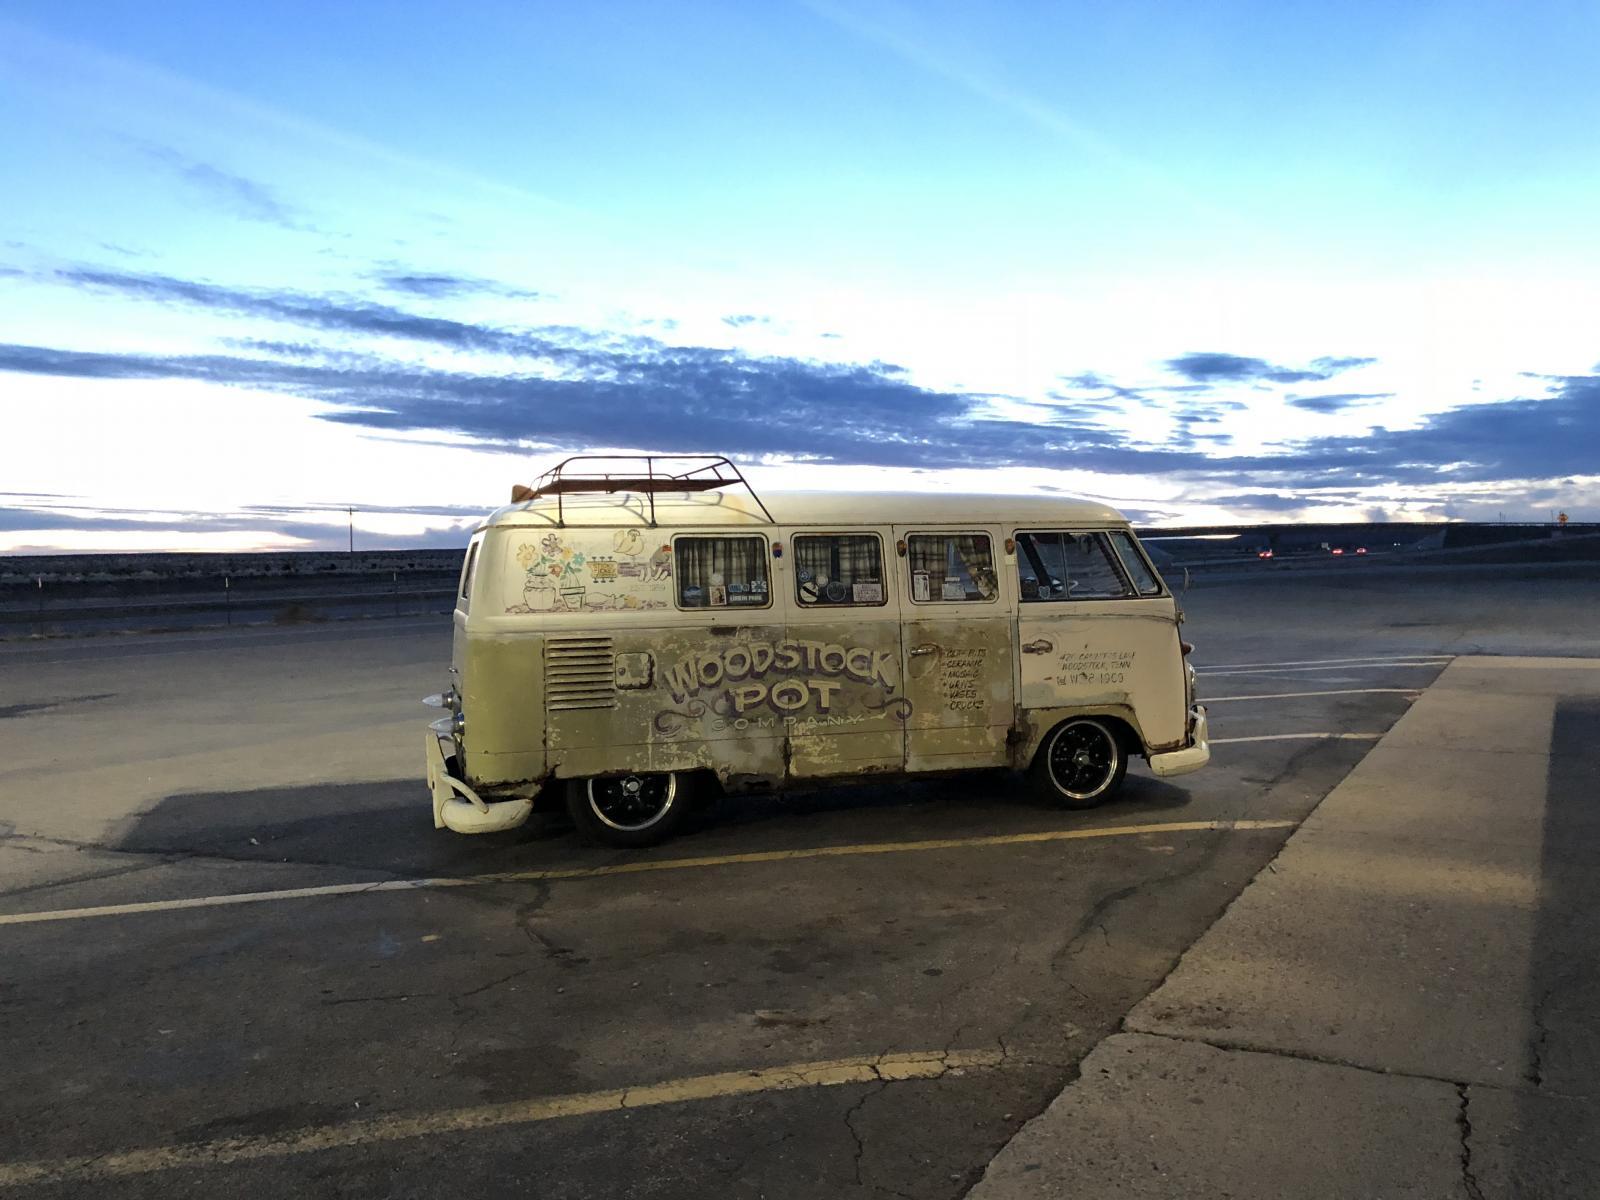 Woodstock Pot Company Bus